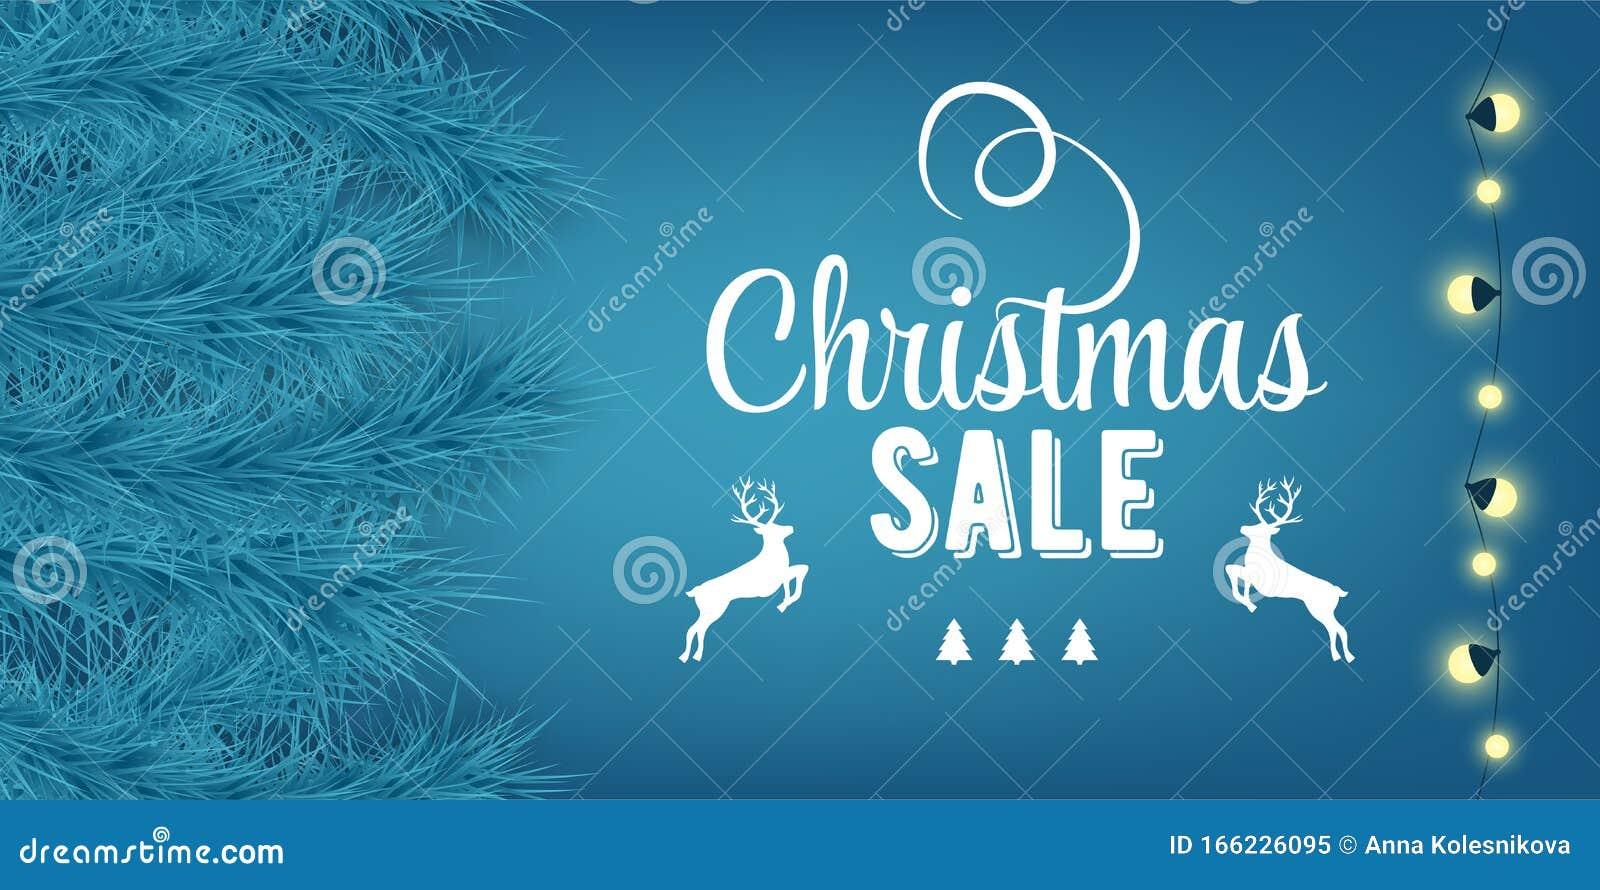 Christmas Wallpaper Blue Stock Illustrations 110 122 Christmas Wallpaper Blue Stock Illustrations Vectors Clipart Dreamstime